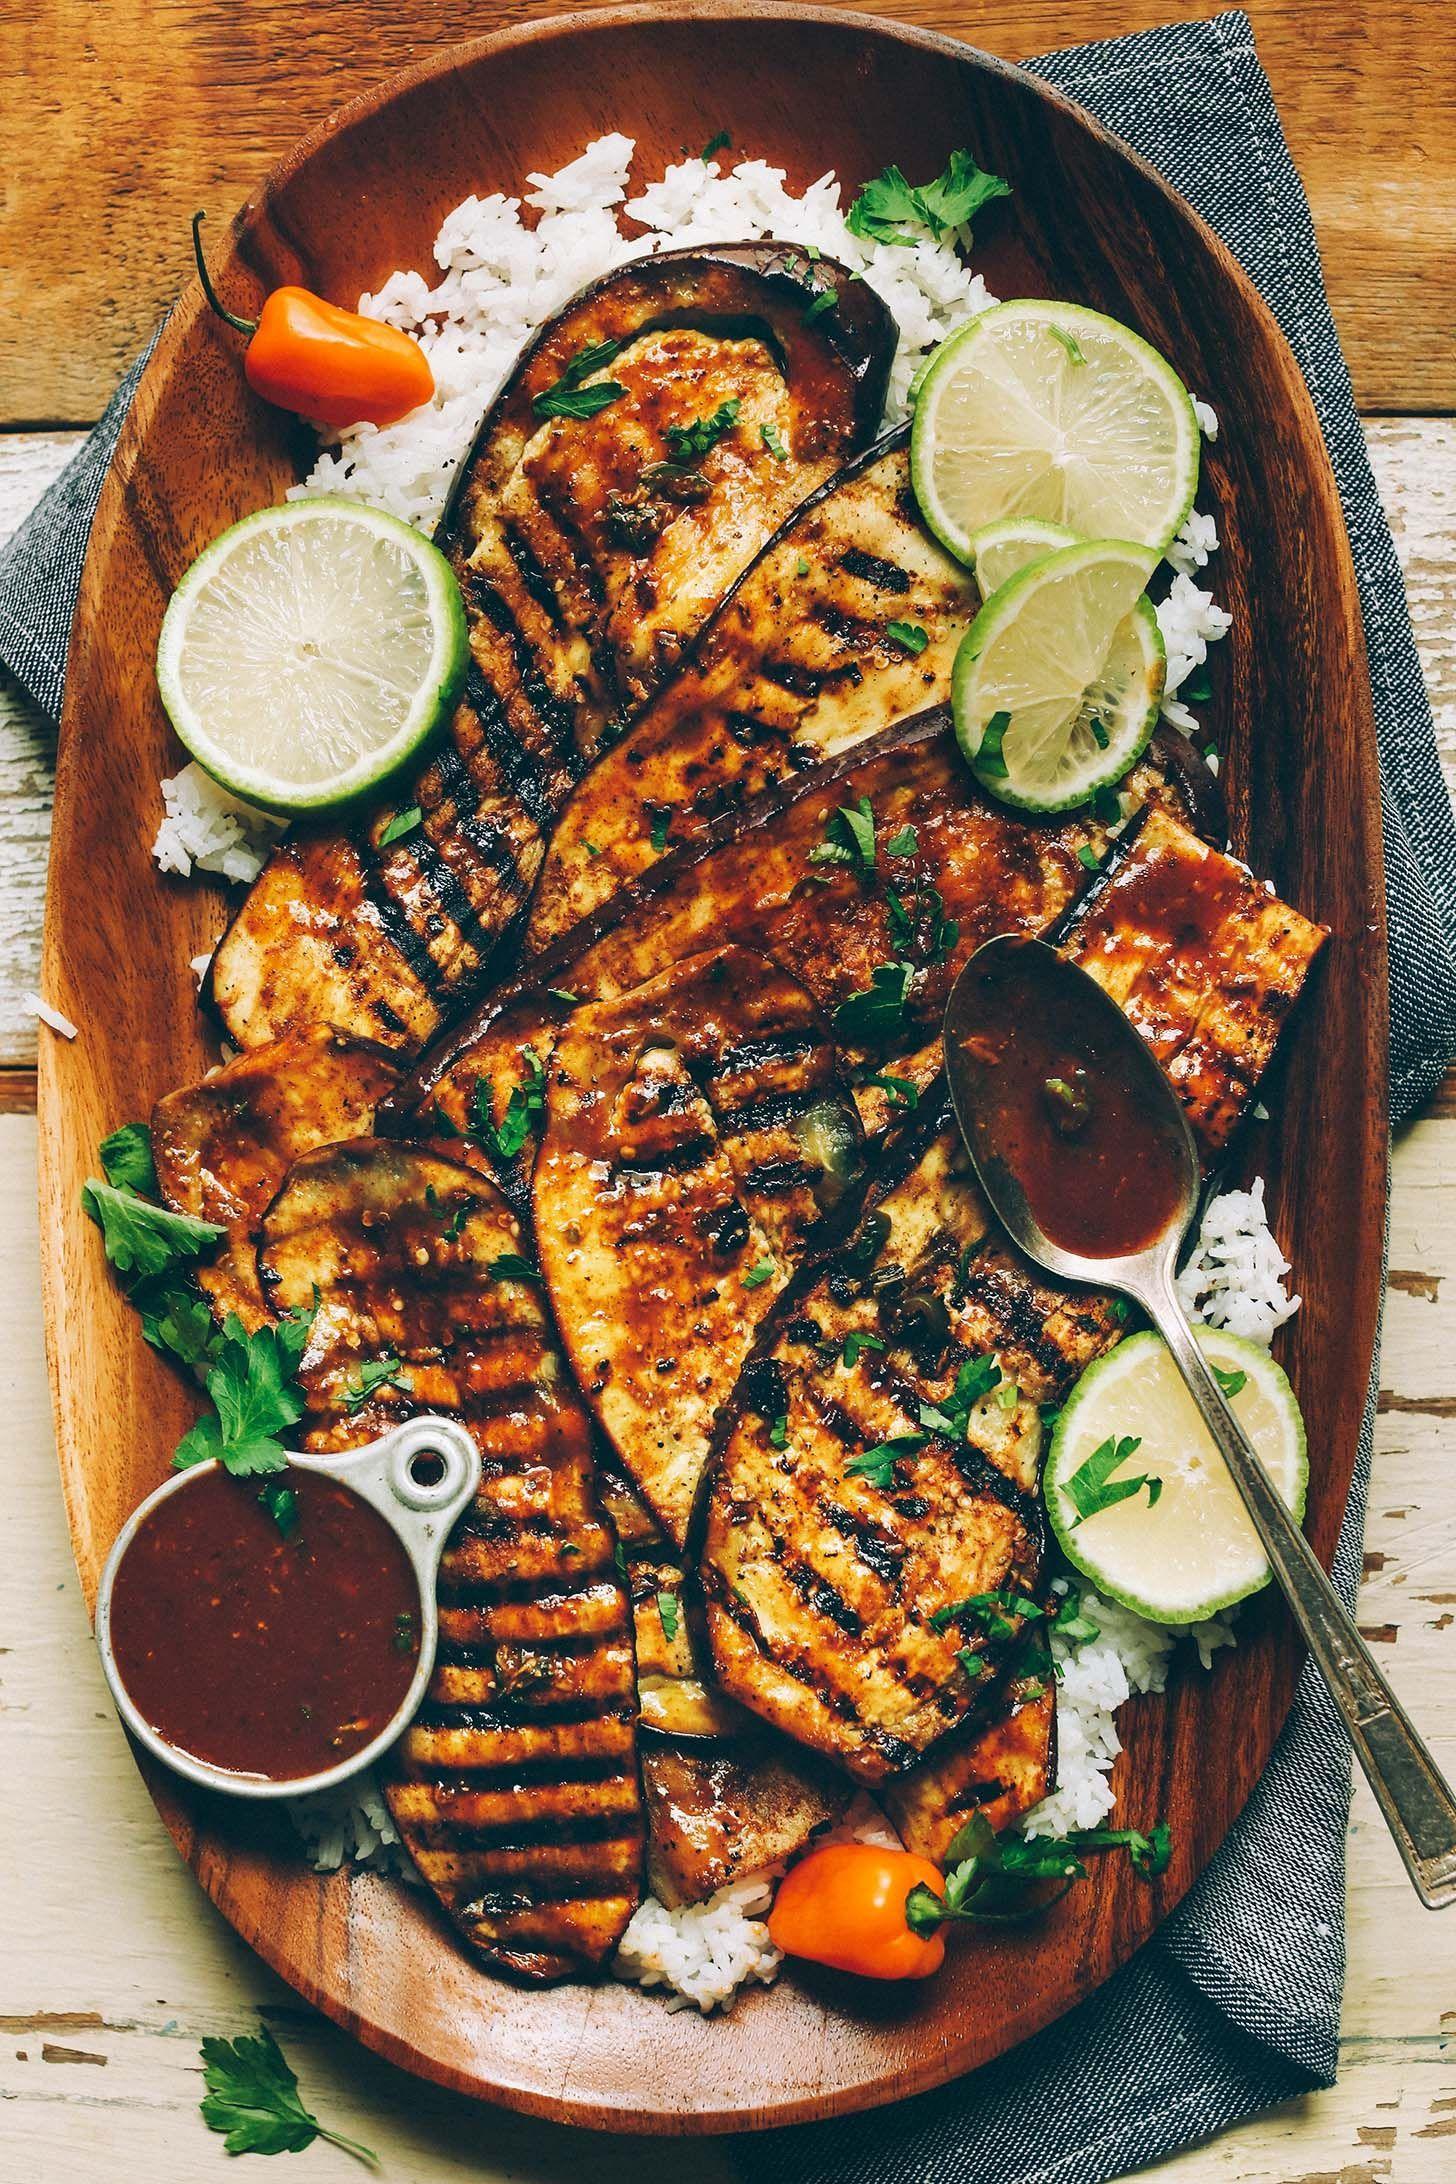 Jamaican Jerk Grilled Eggplant (30 Minutes!) #vegetariangrilling Jamaican Jerk Grilled Eggplant (30 Minutes!)